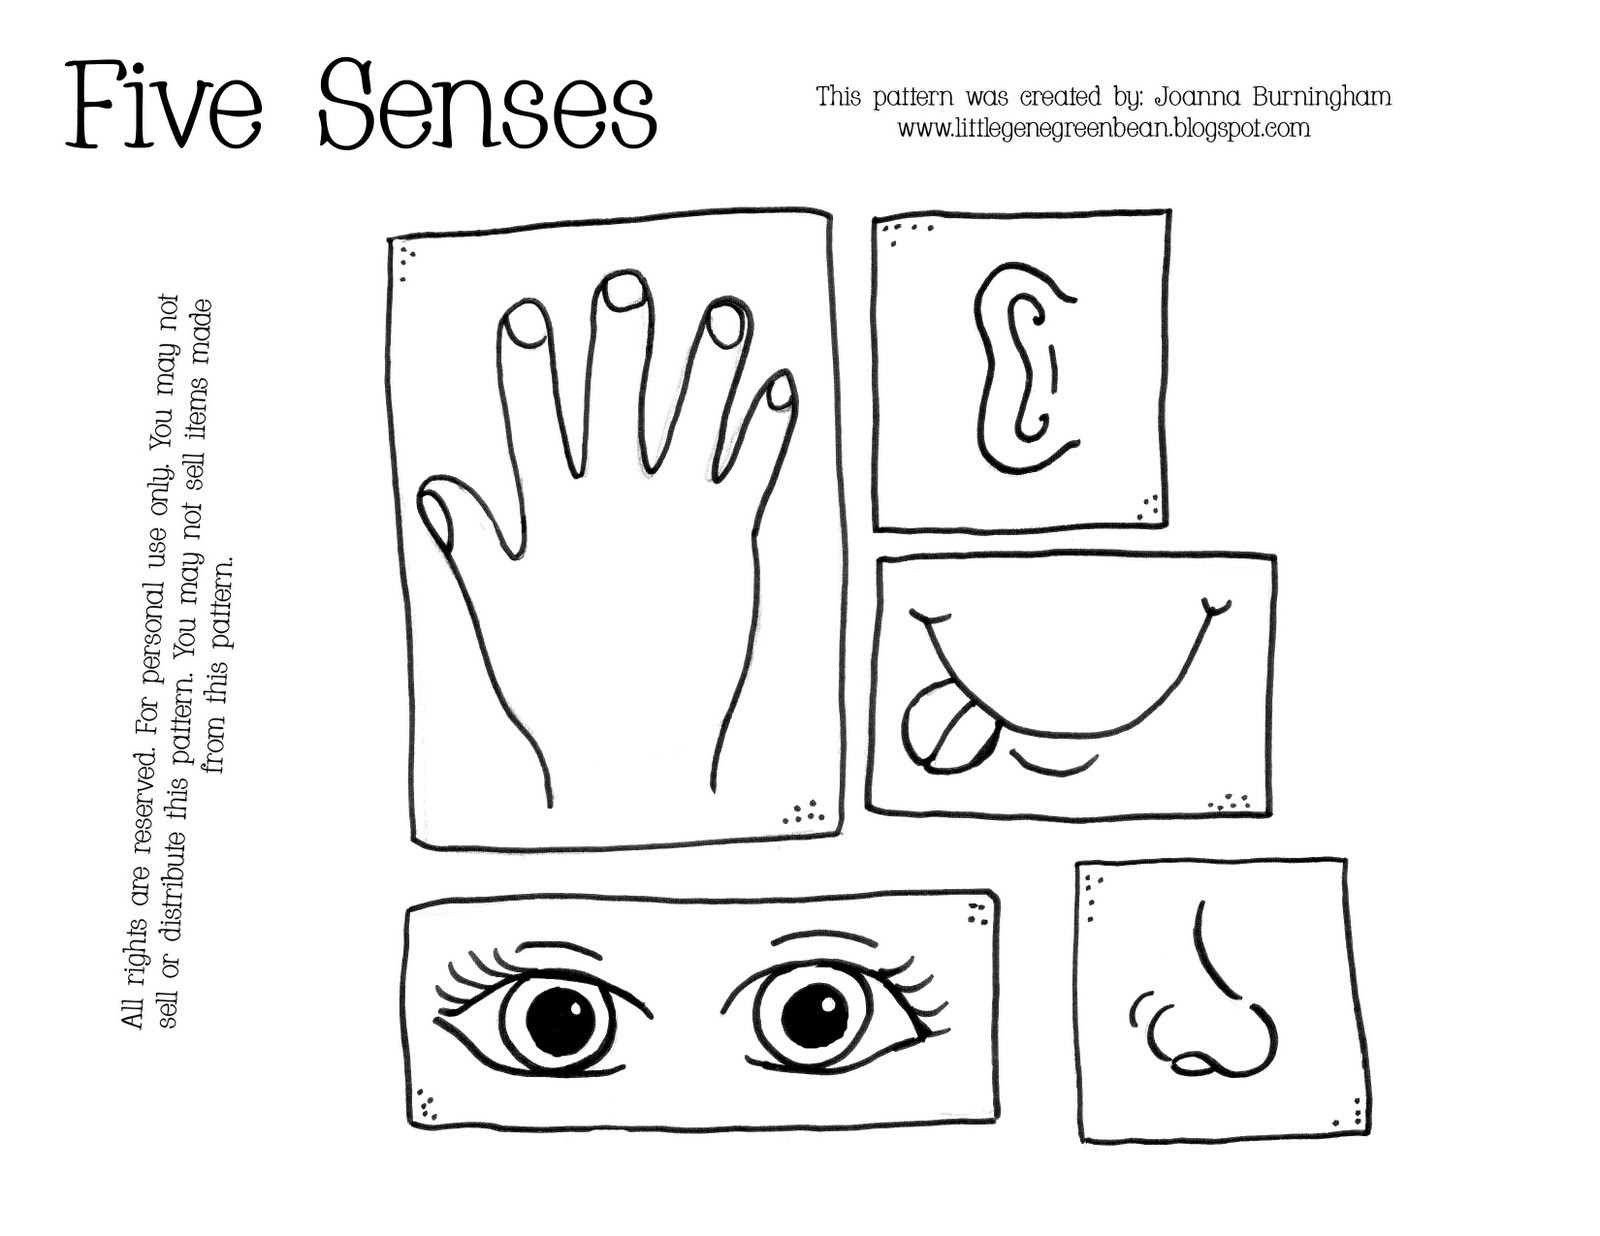 5 Senses Coloring Pages  Little Gene Green Bean All About Me Unit 2